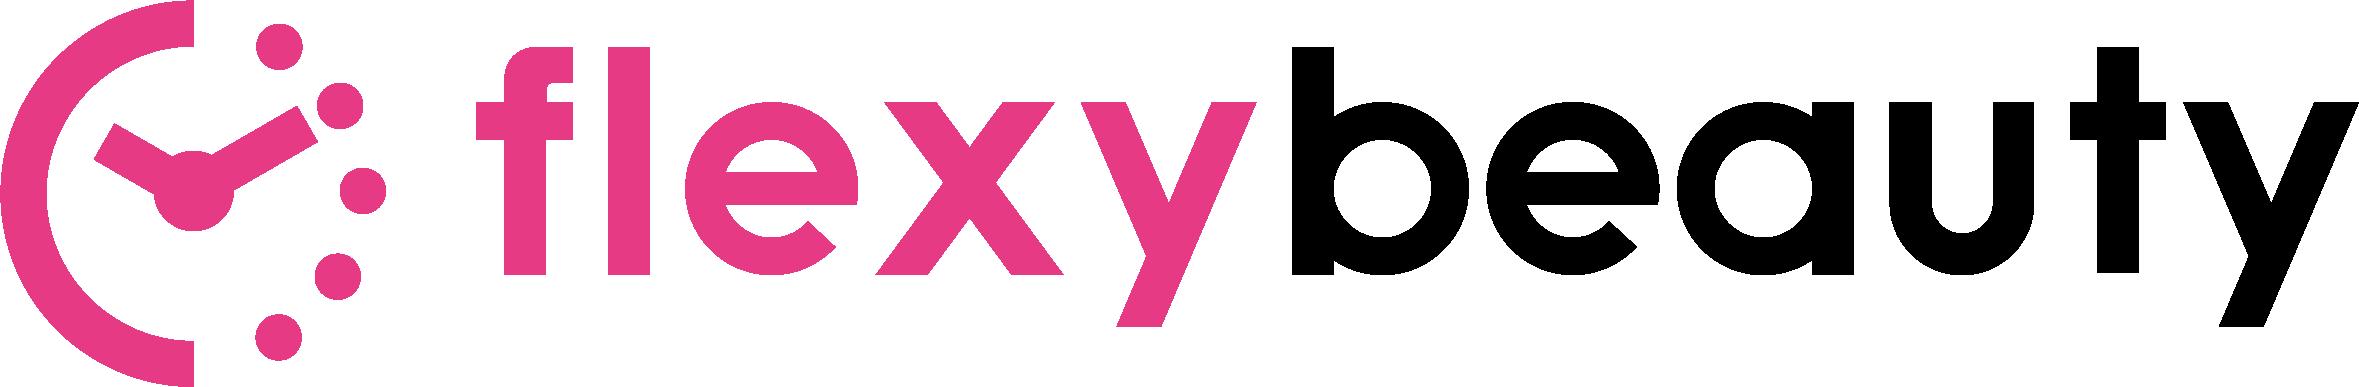 FlexyBeauty_logo-sans-baseline-fd_blc.png